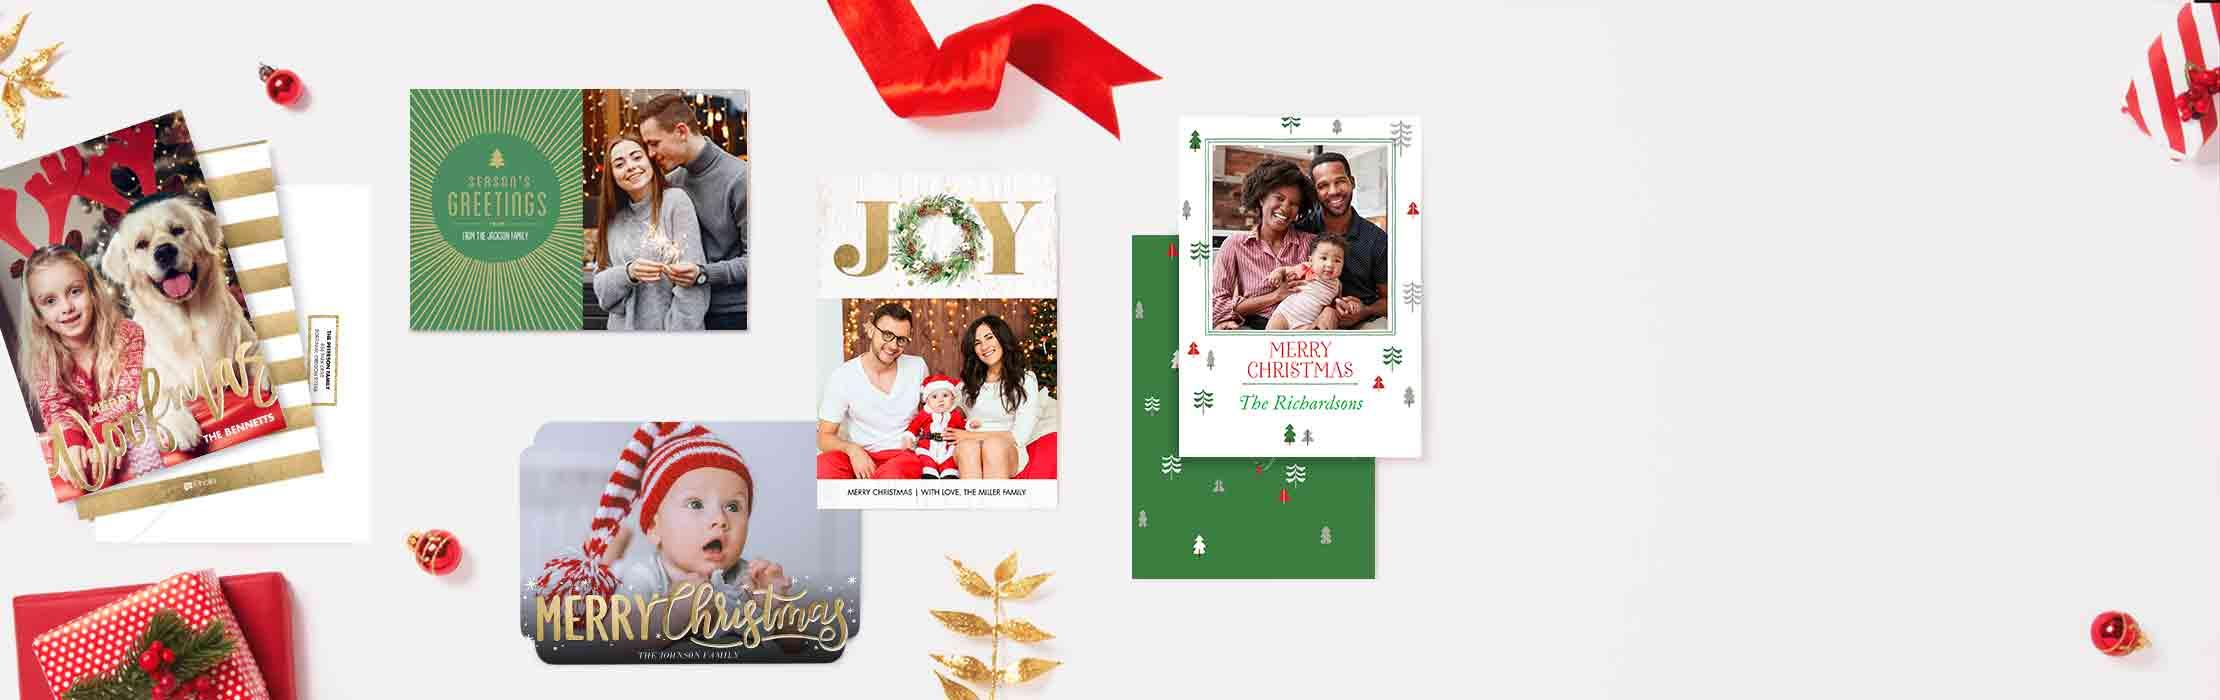 Easy-to-make heartfelt cards